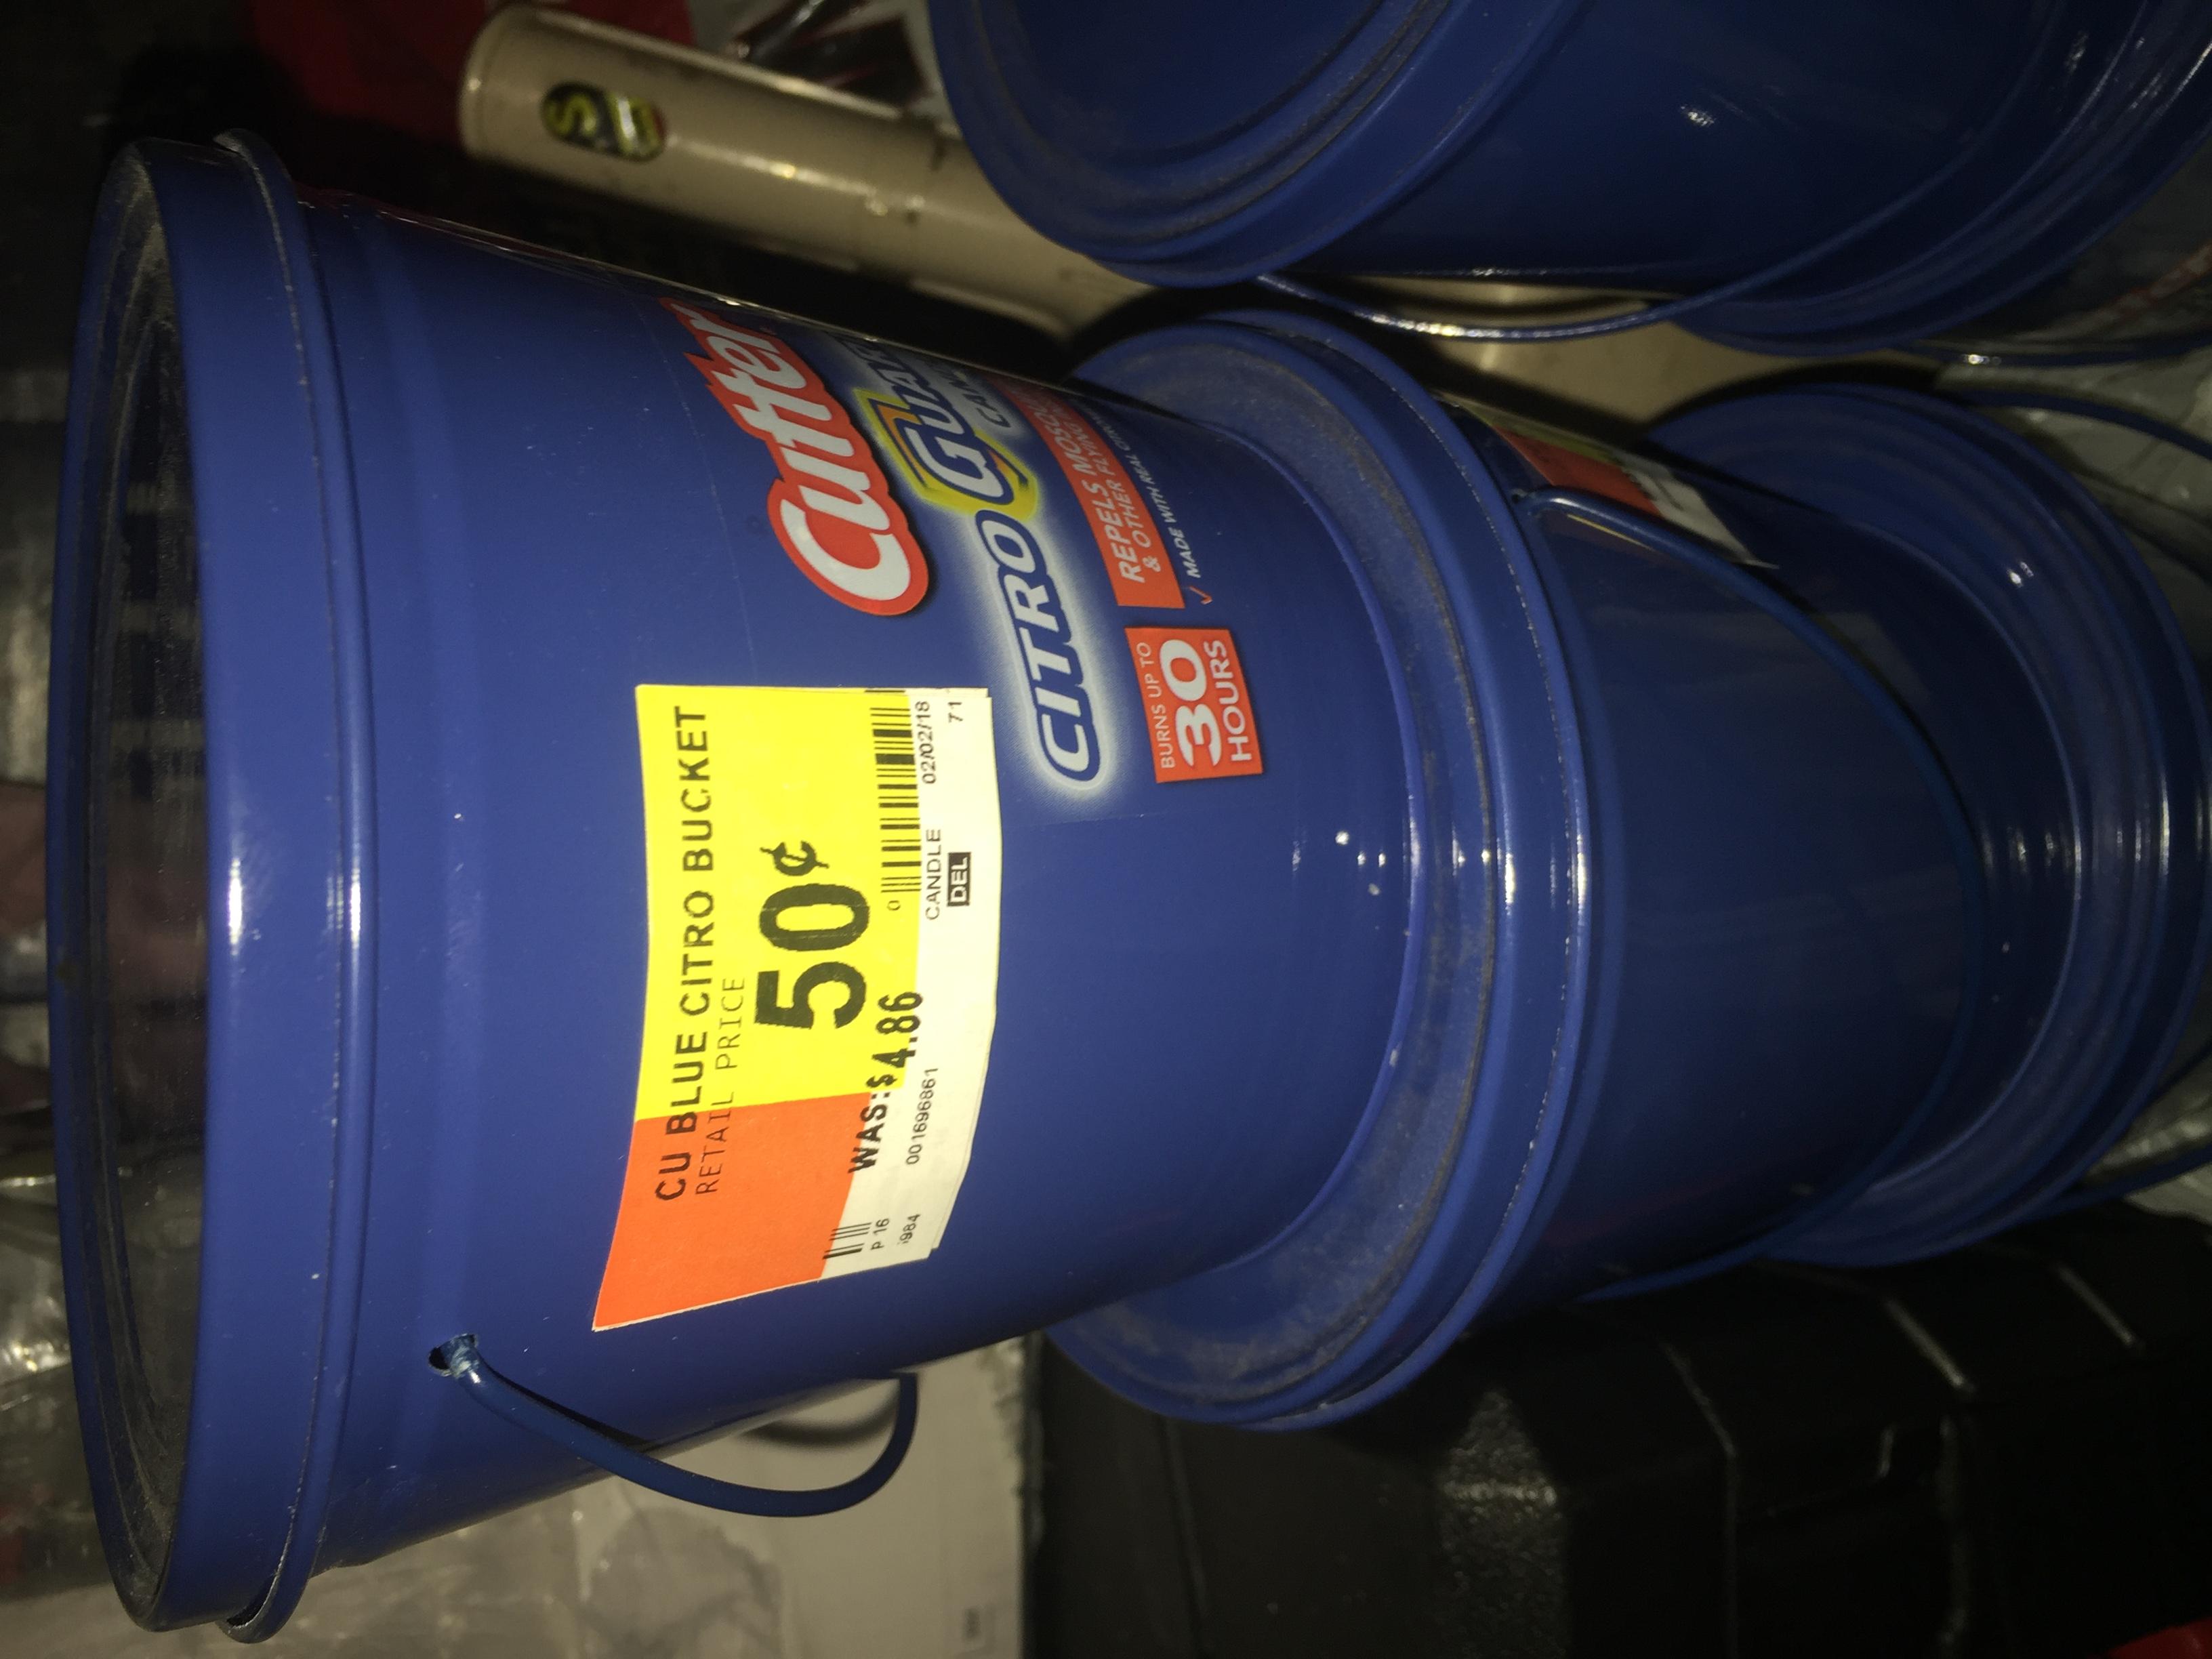 Cutter CitroGuard Bucket Candles $0.50 @ Walmart reg $5 B&M YMMV CLEARANCE